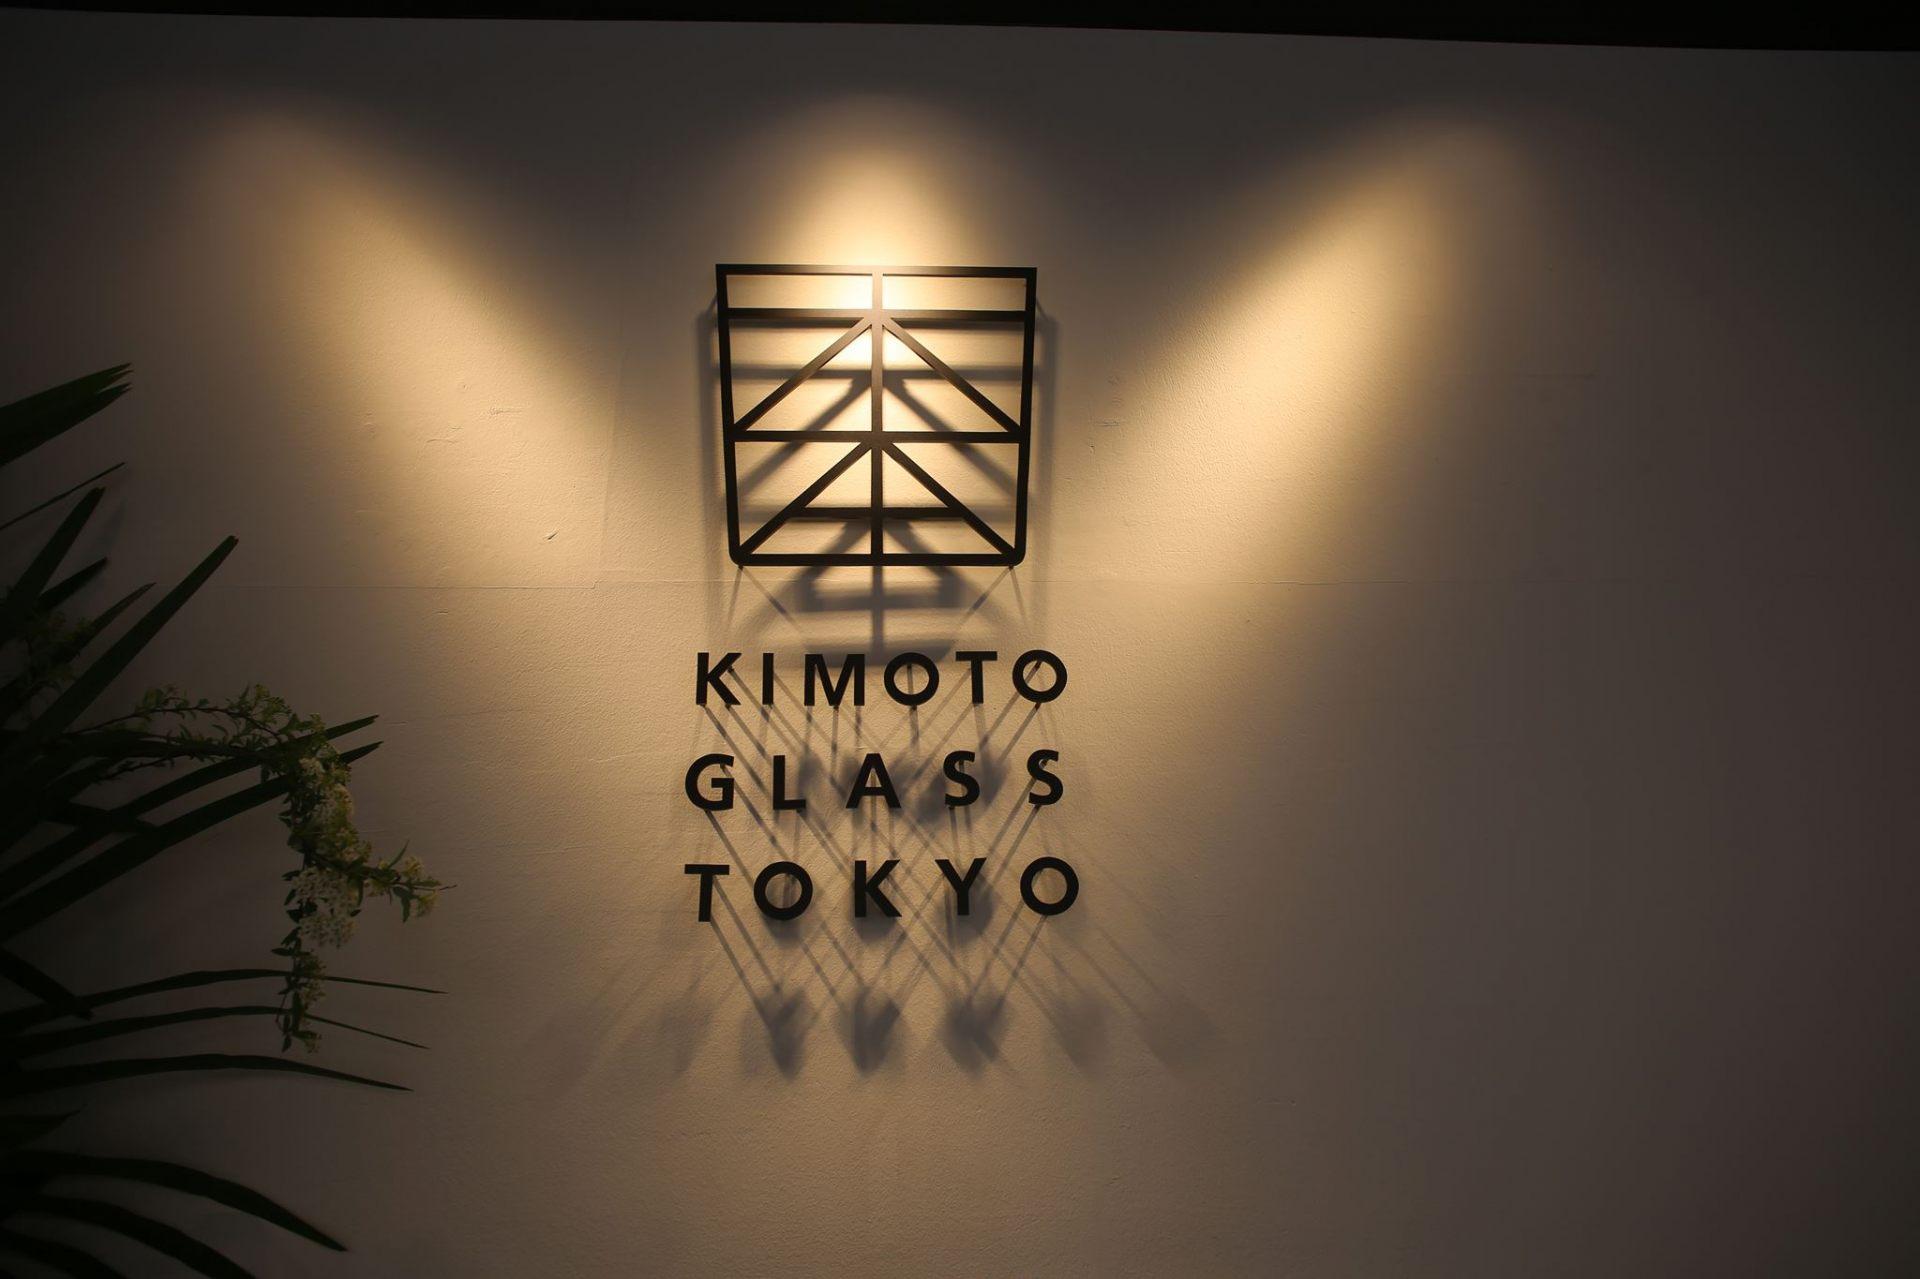 KIMOTO GLASSWEAR